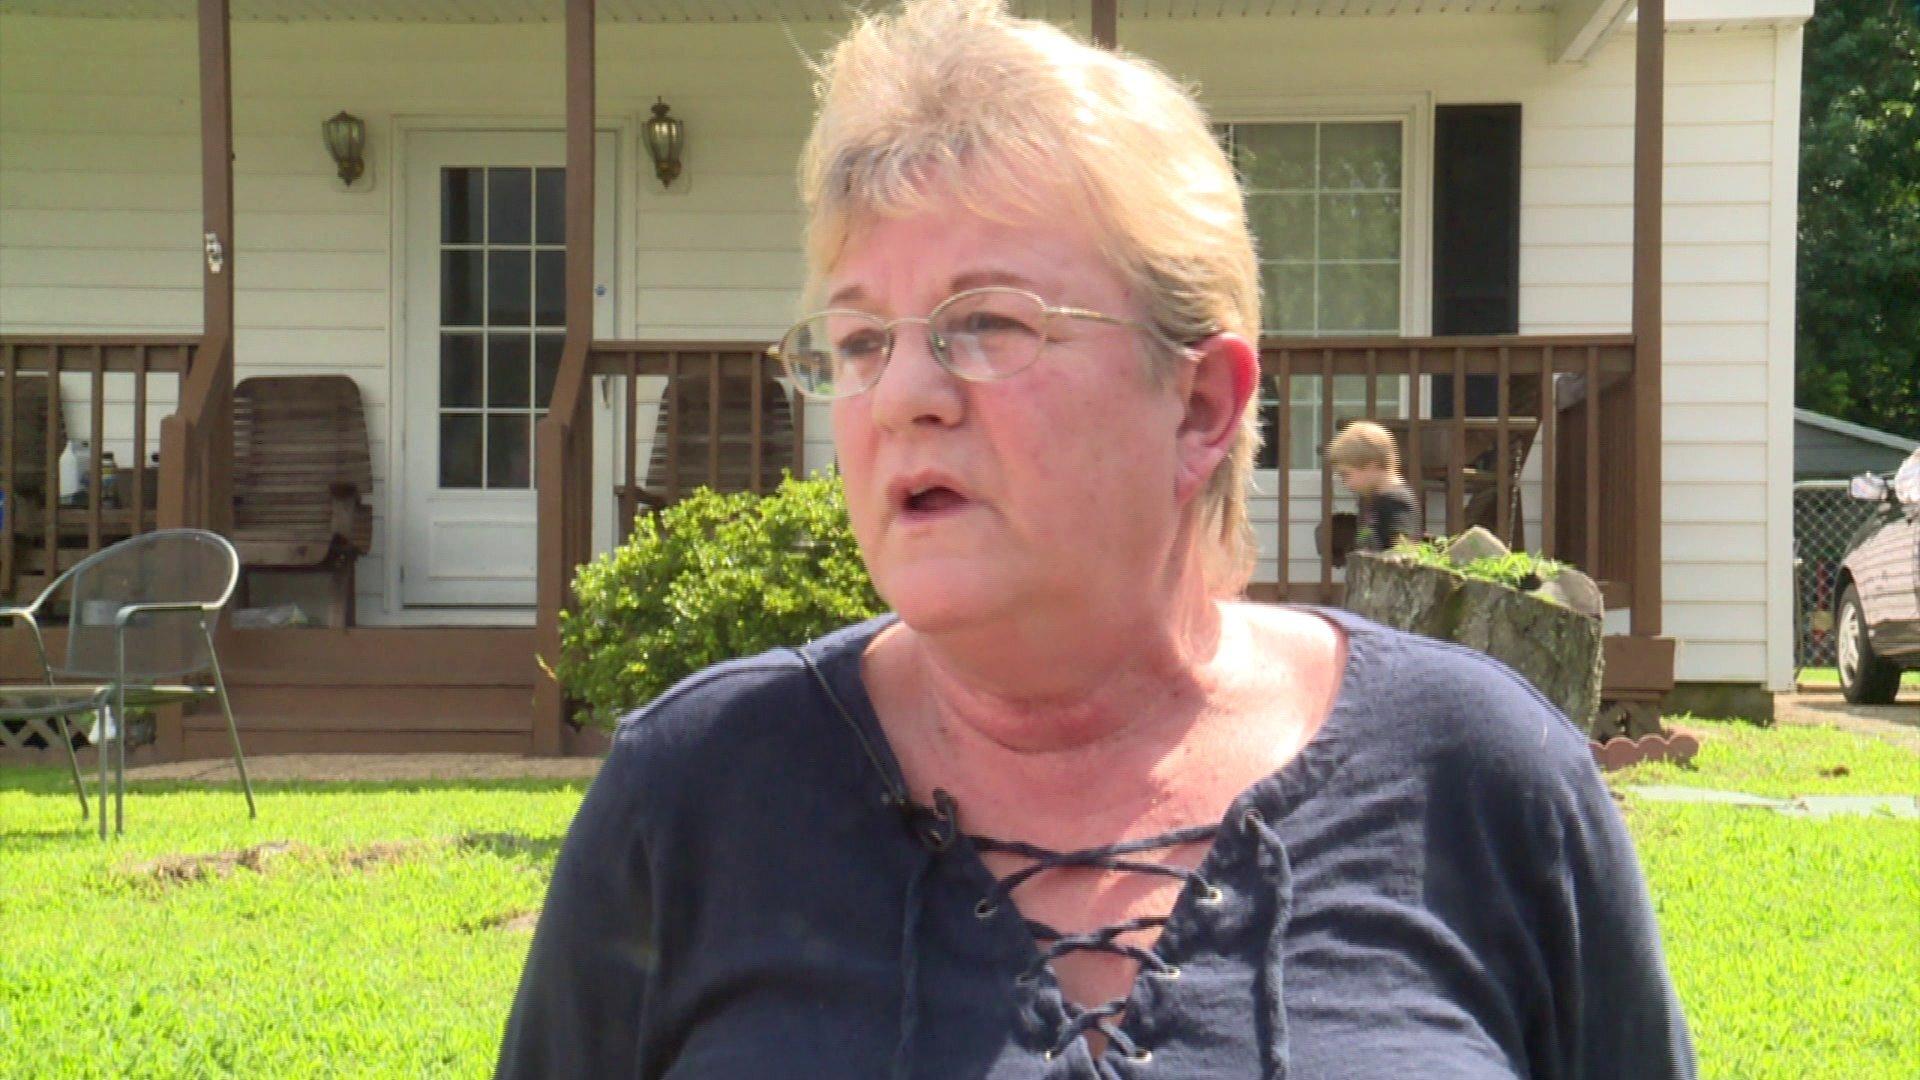 Photos: Chesterfield neighbors react to car break-ins: 'It's unbelievable. It's got tostop!'